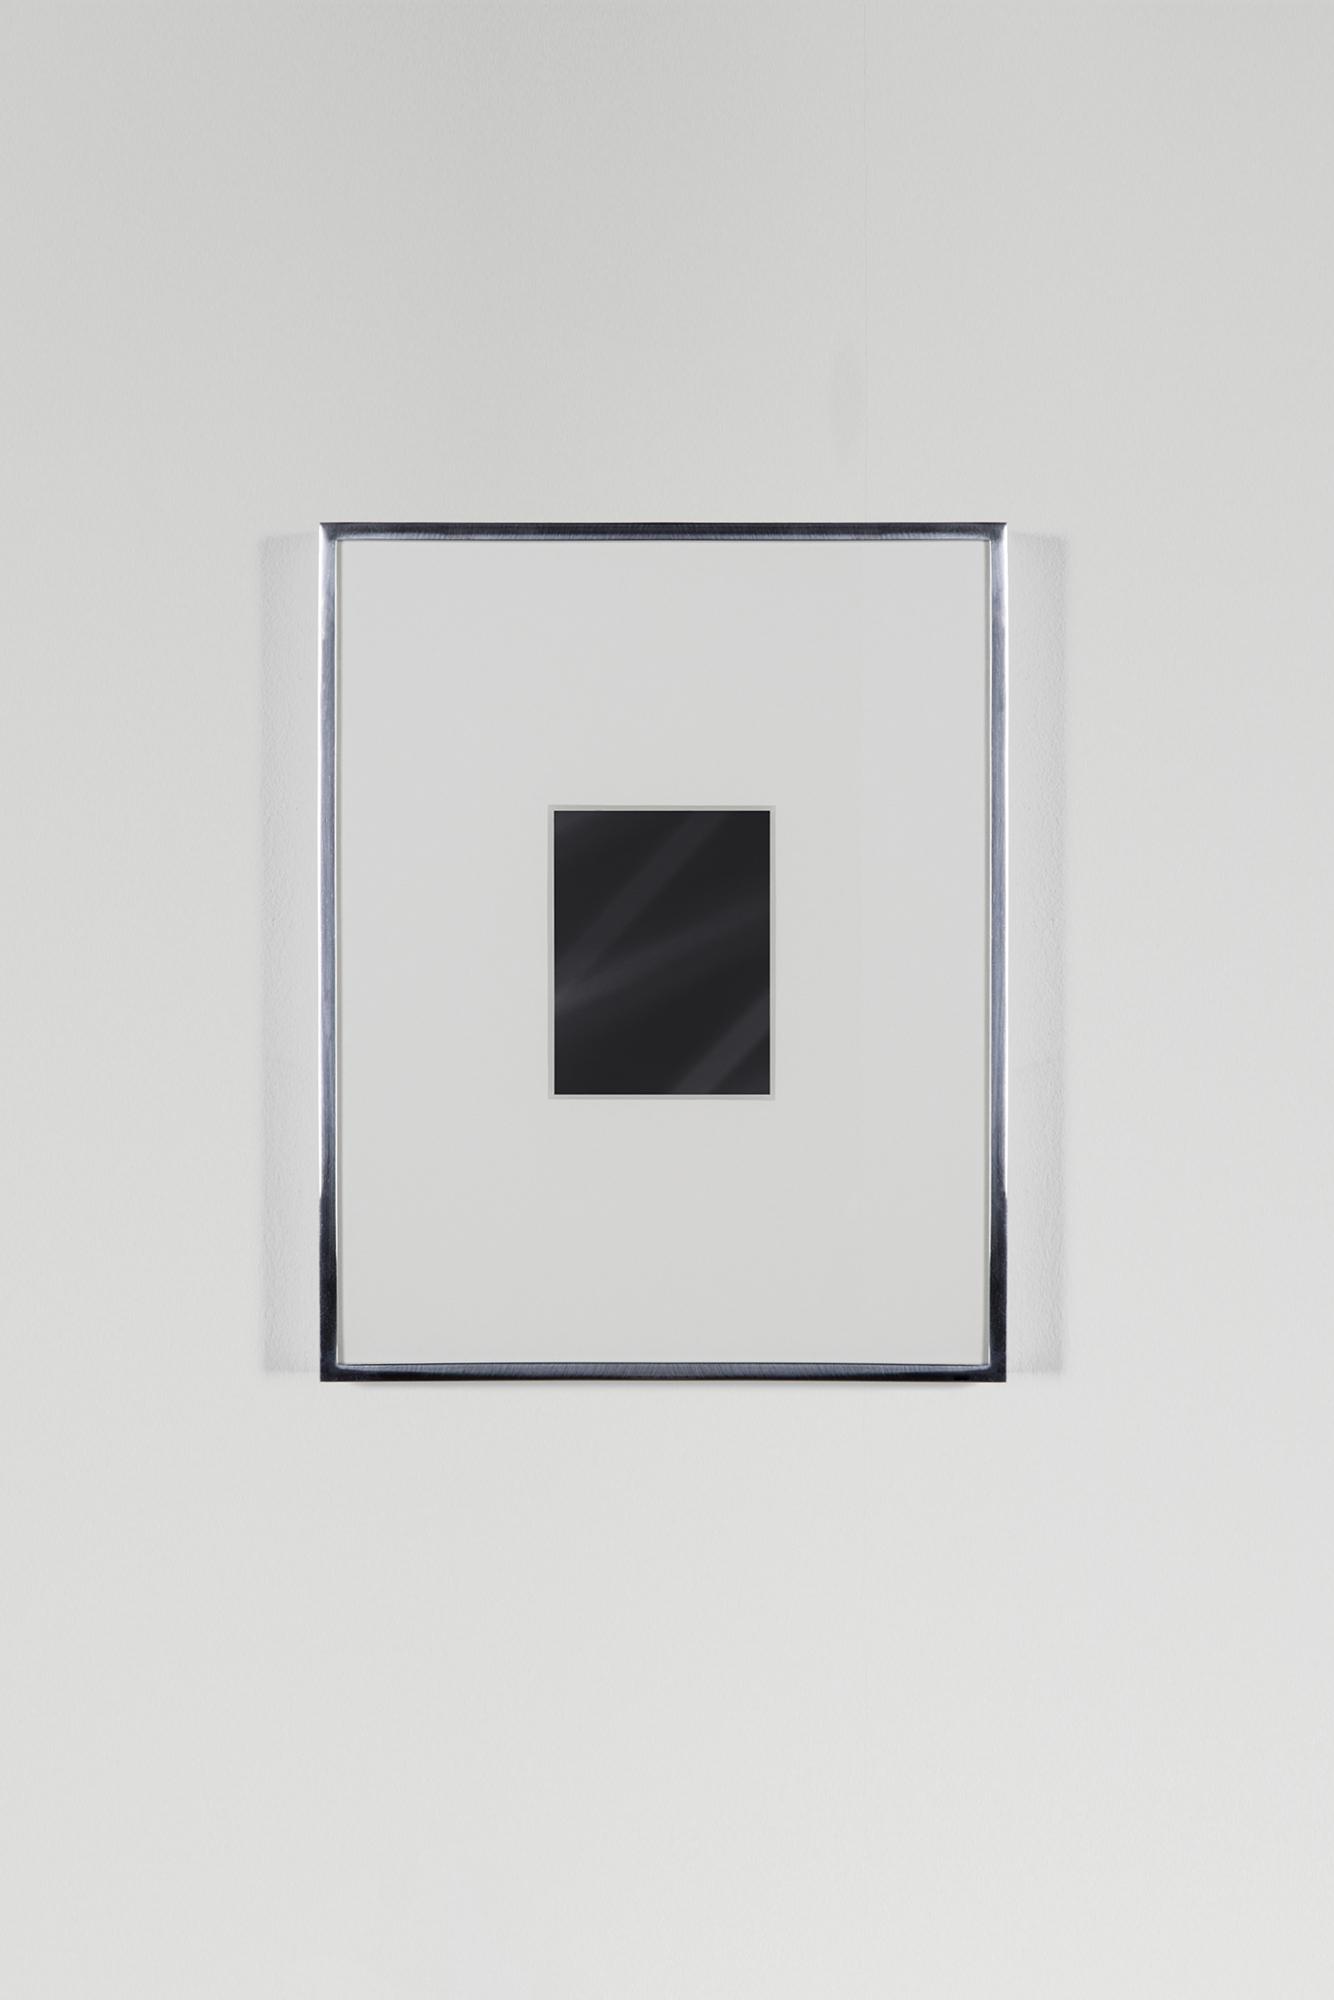 Transparency (Negative) [Kodak Portra 400NC Em. No. 1022: November 18–30, 2016 LAX/JFK JFK/MIA MIA/LAX]    2017   Epson Ultrachrome K3 archival ink jet print on Museo Silver Rag Paper  14 x 11 inches   Transparencies, 2014–